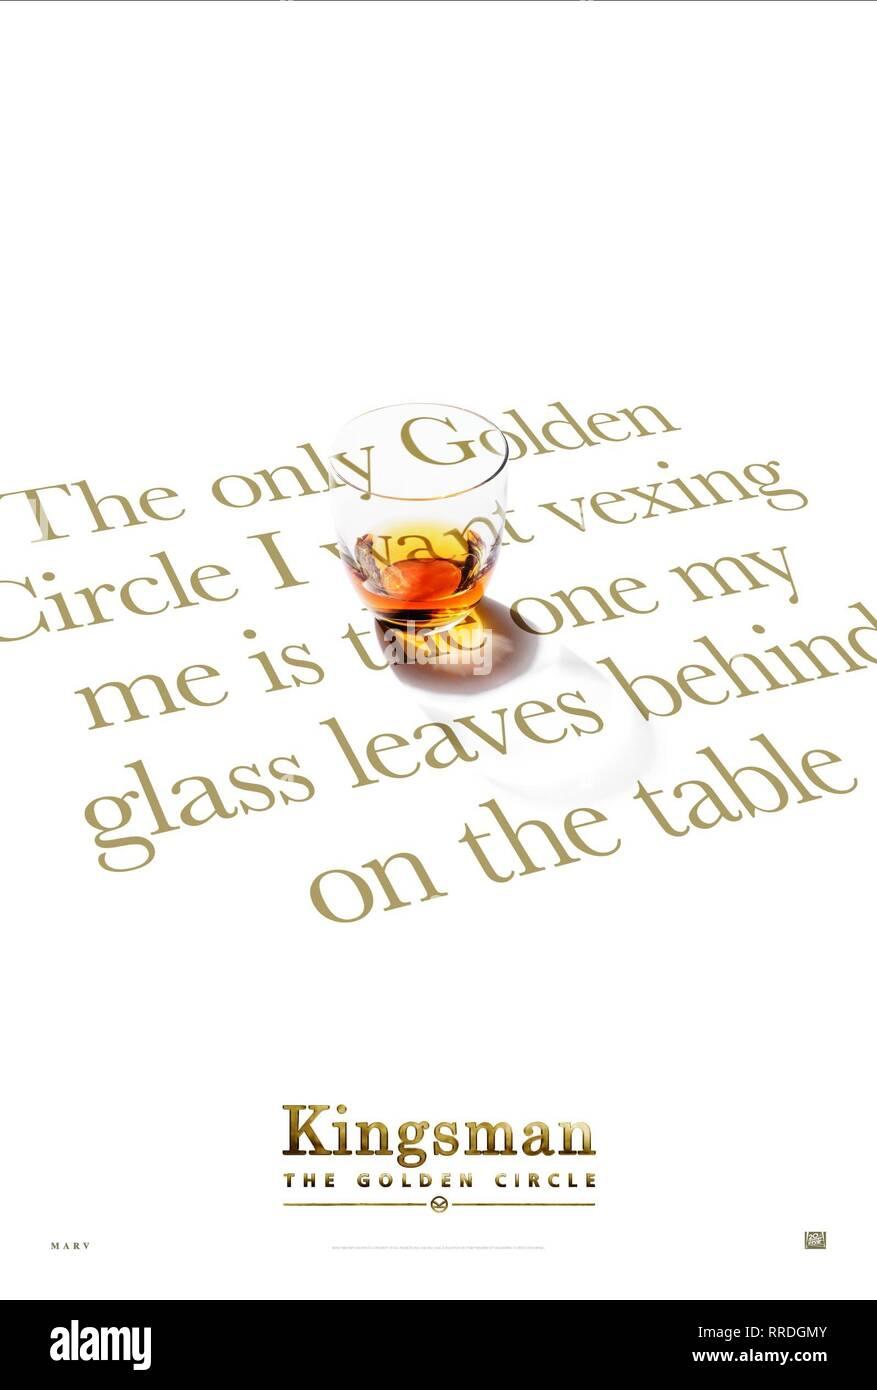 KINGSMAN: THE GOLDEN CIRCLE, MOVIE POSTER, 2017 - Stock Image